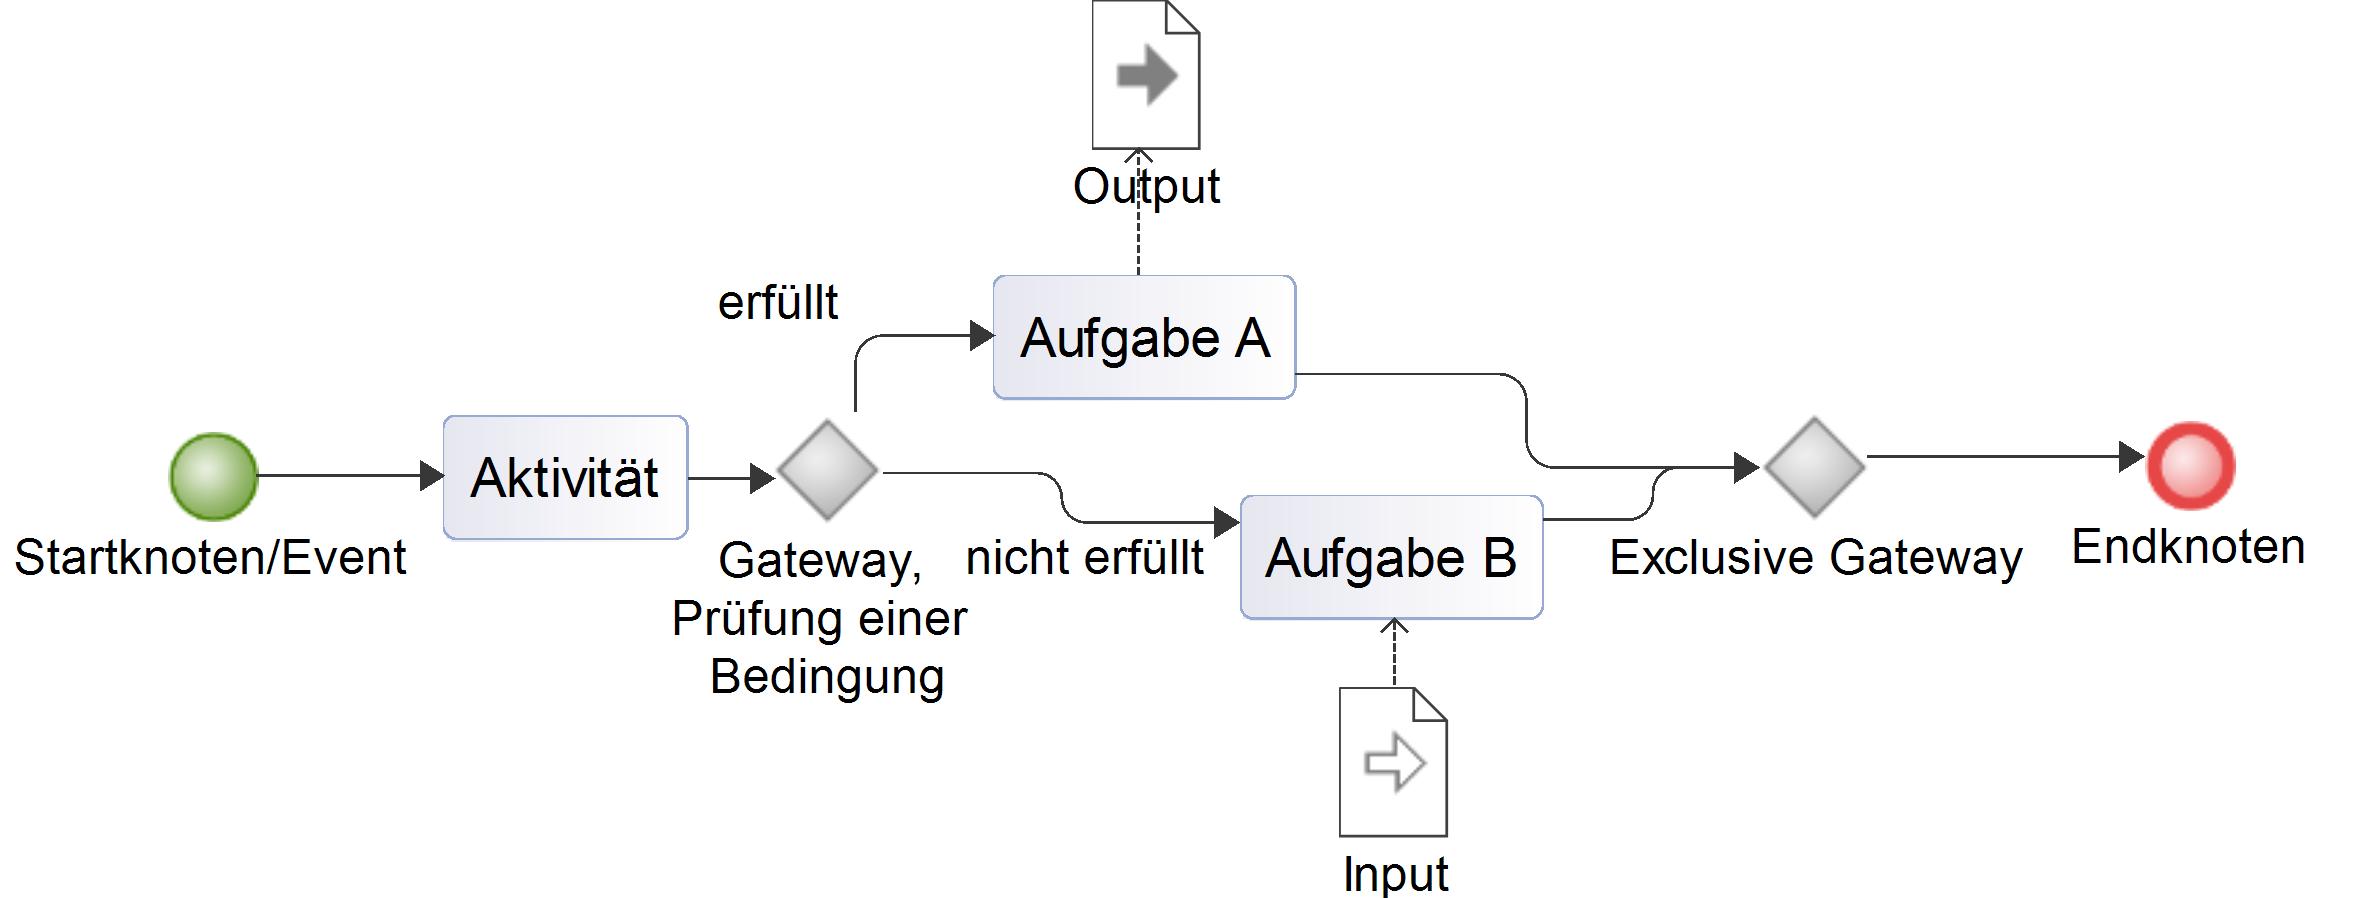 Abbildung 1: Notationselemente BPMN    © TU Chemnitz